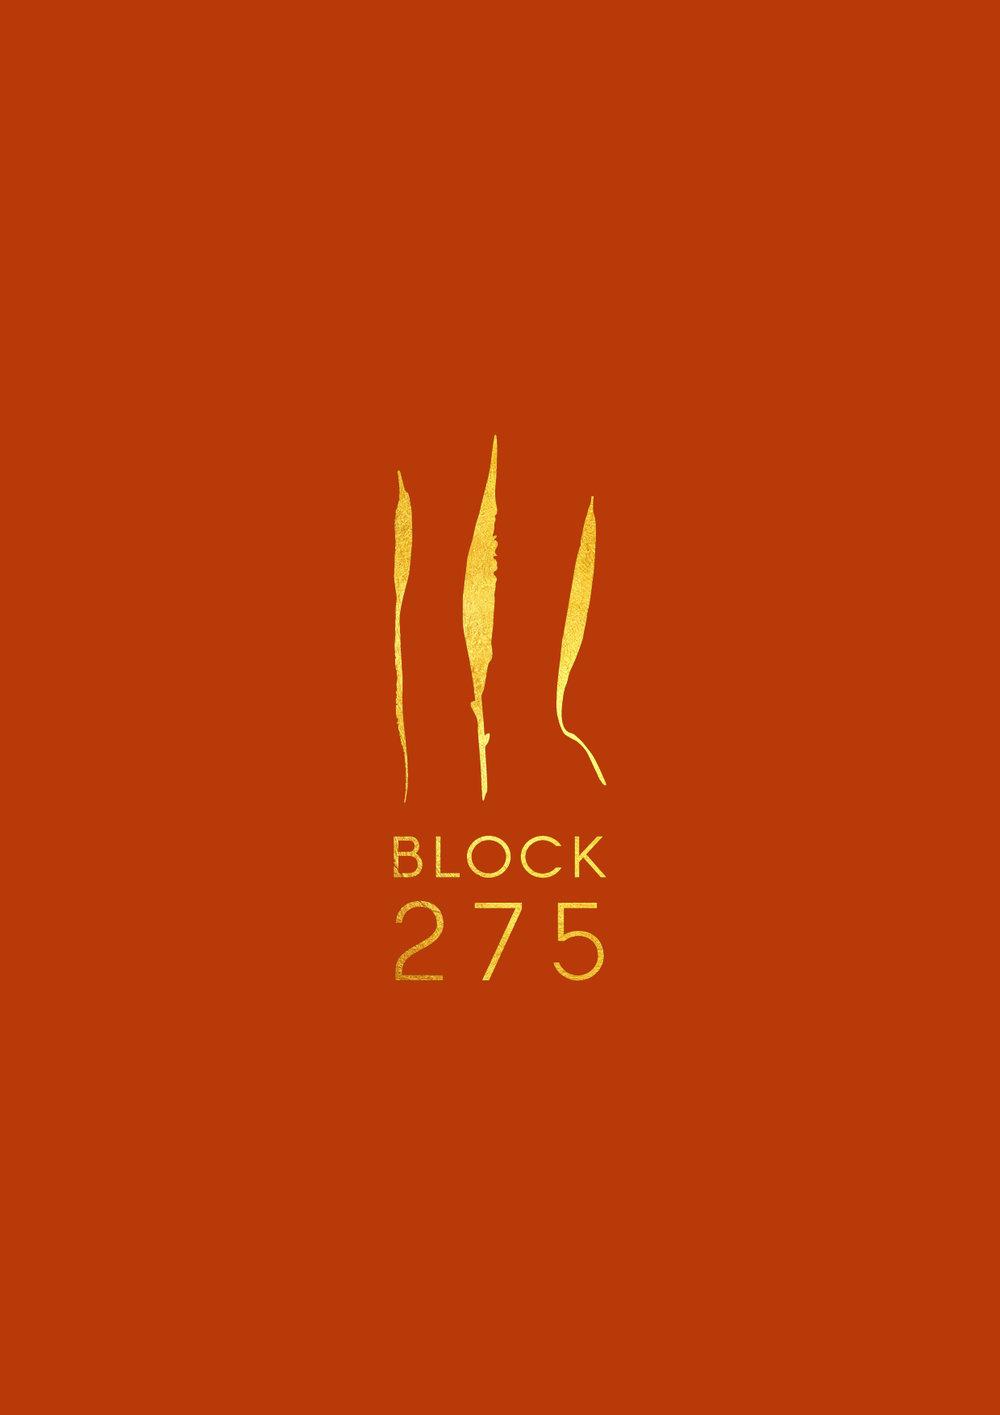 Block 275_Logo Concept 3 - 3.jpg